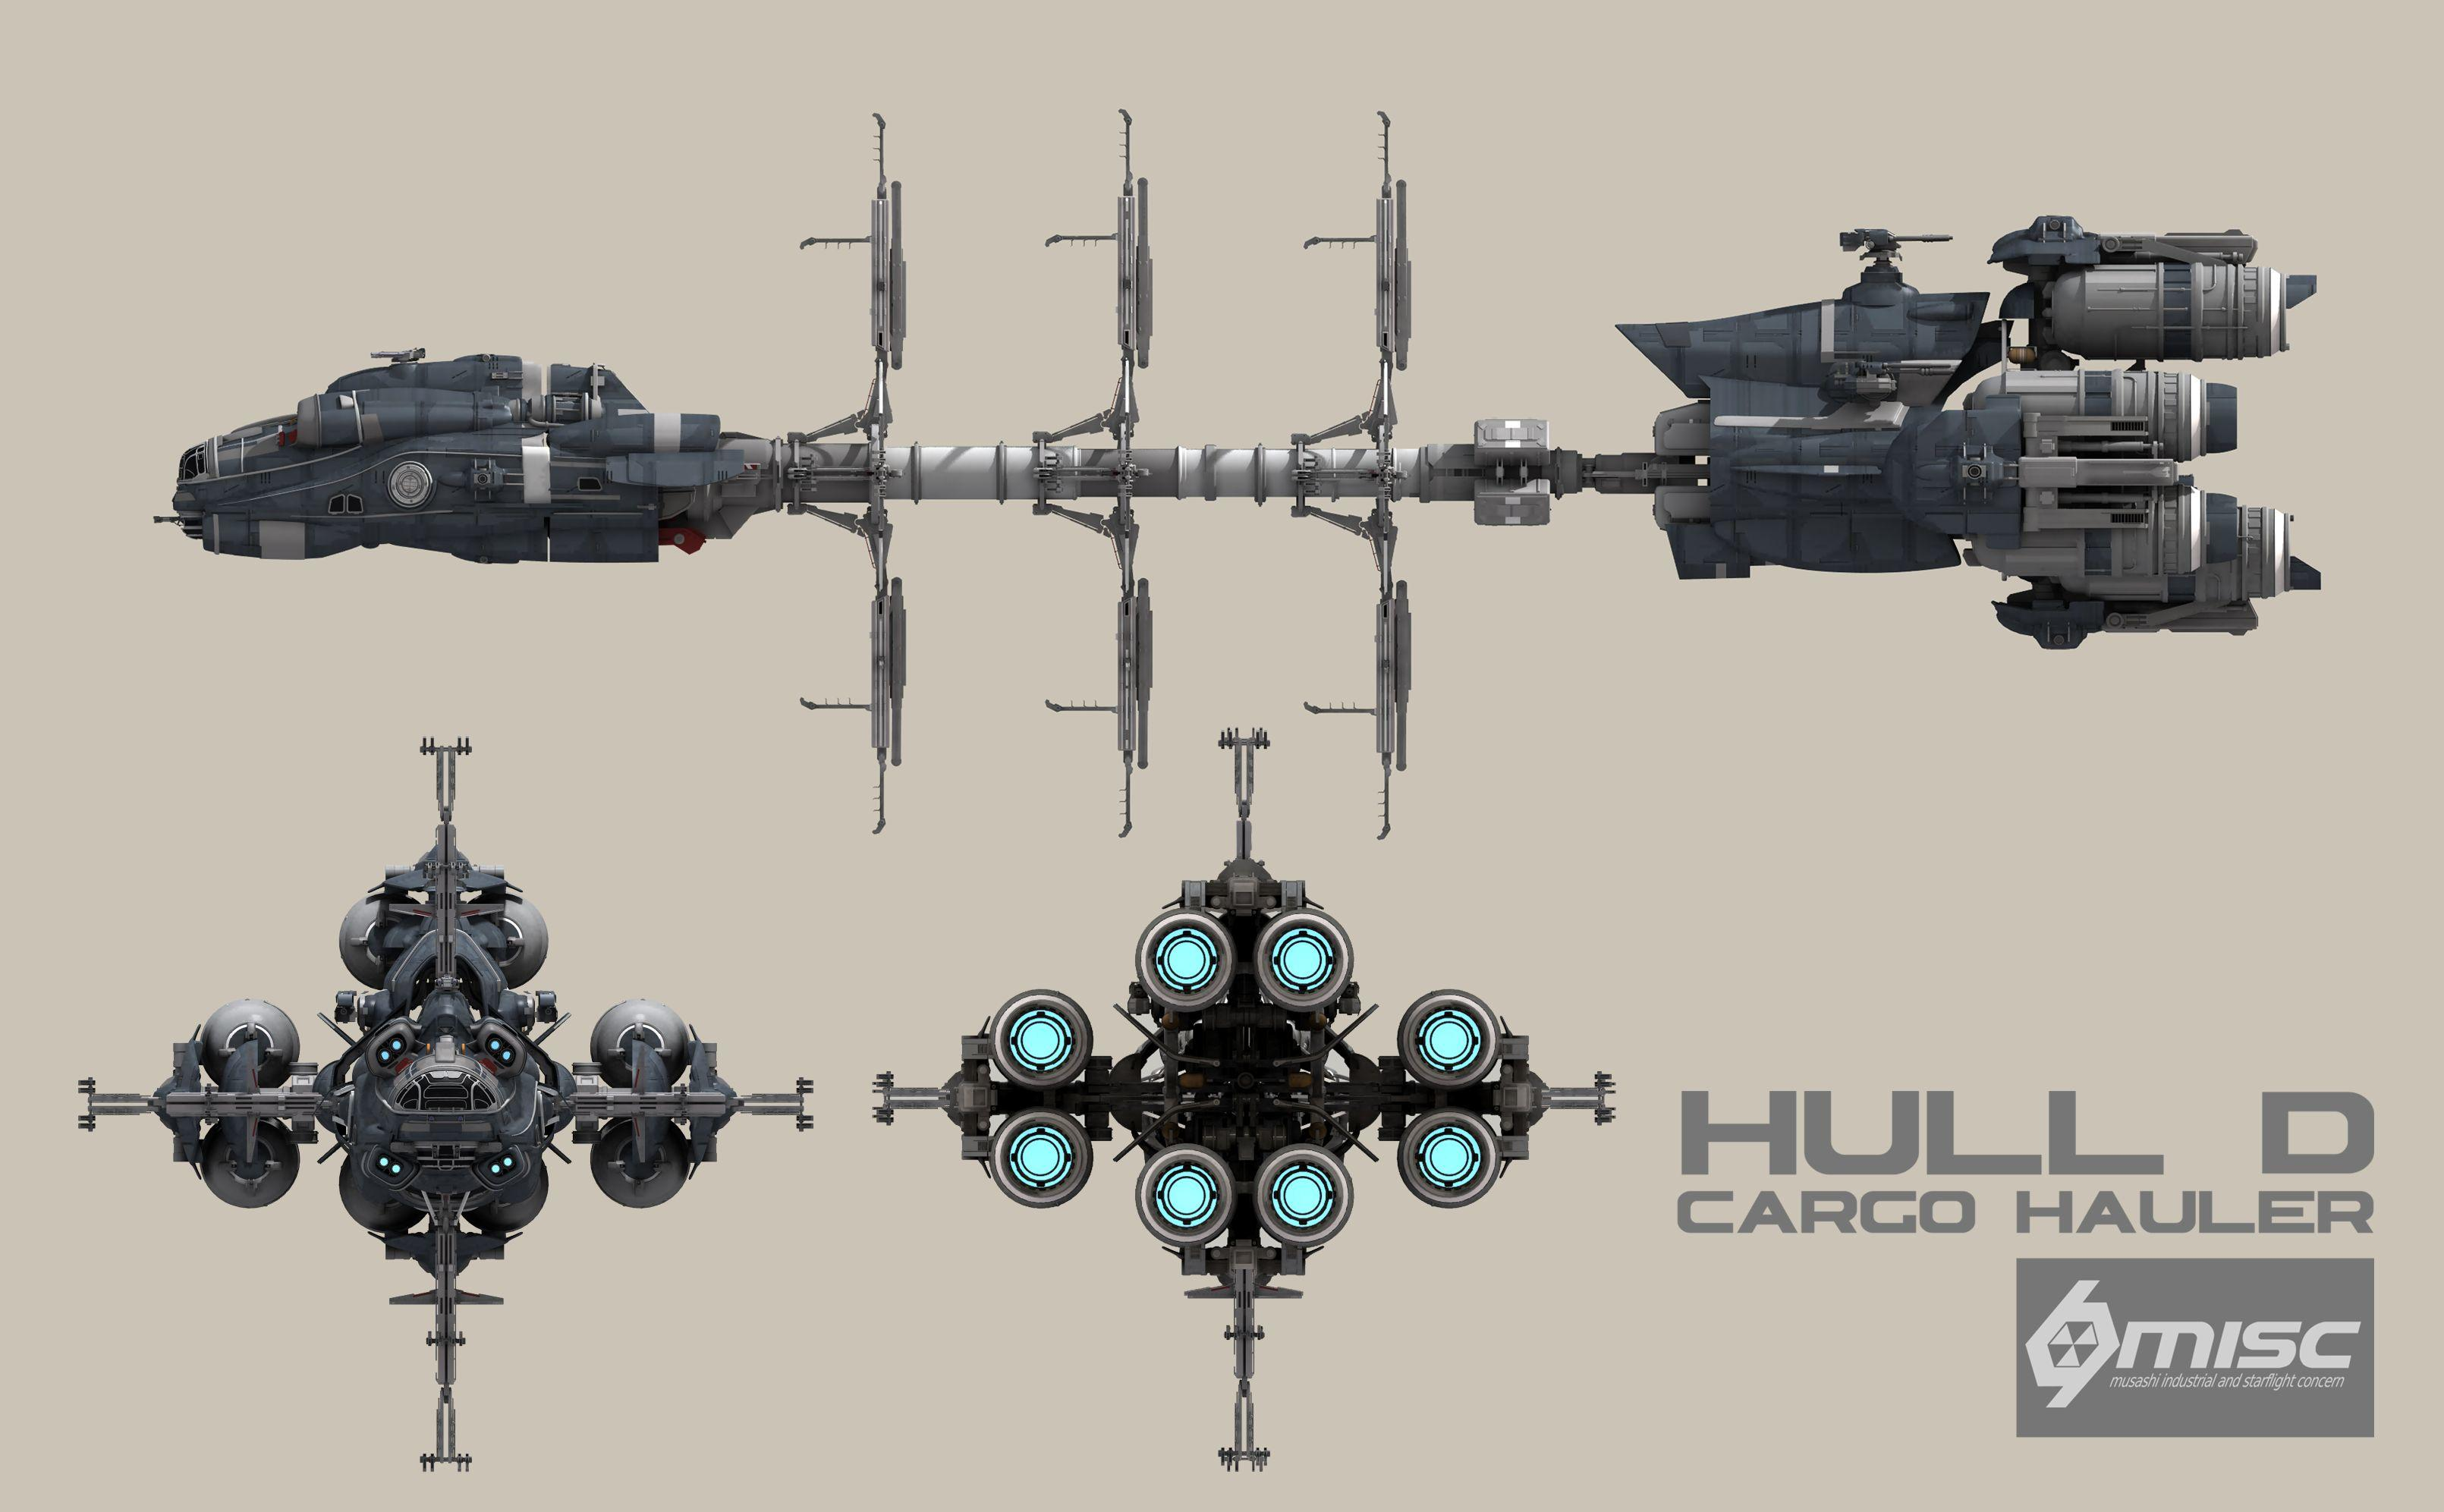 Hull D